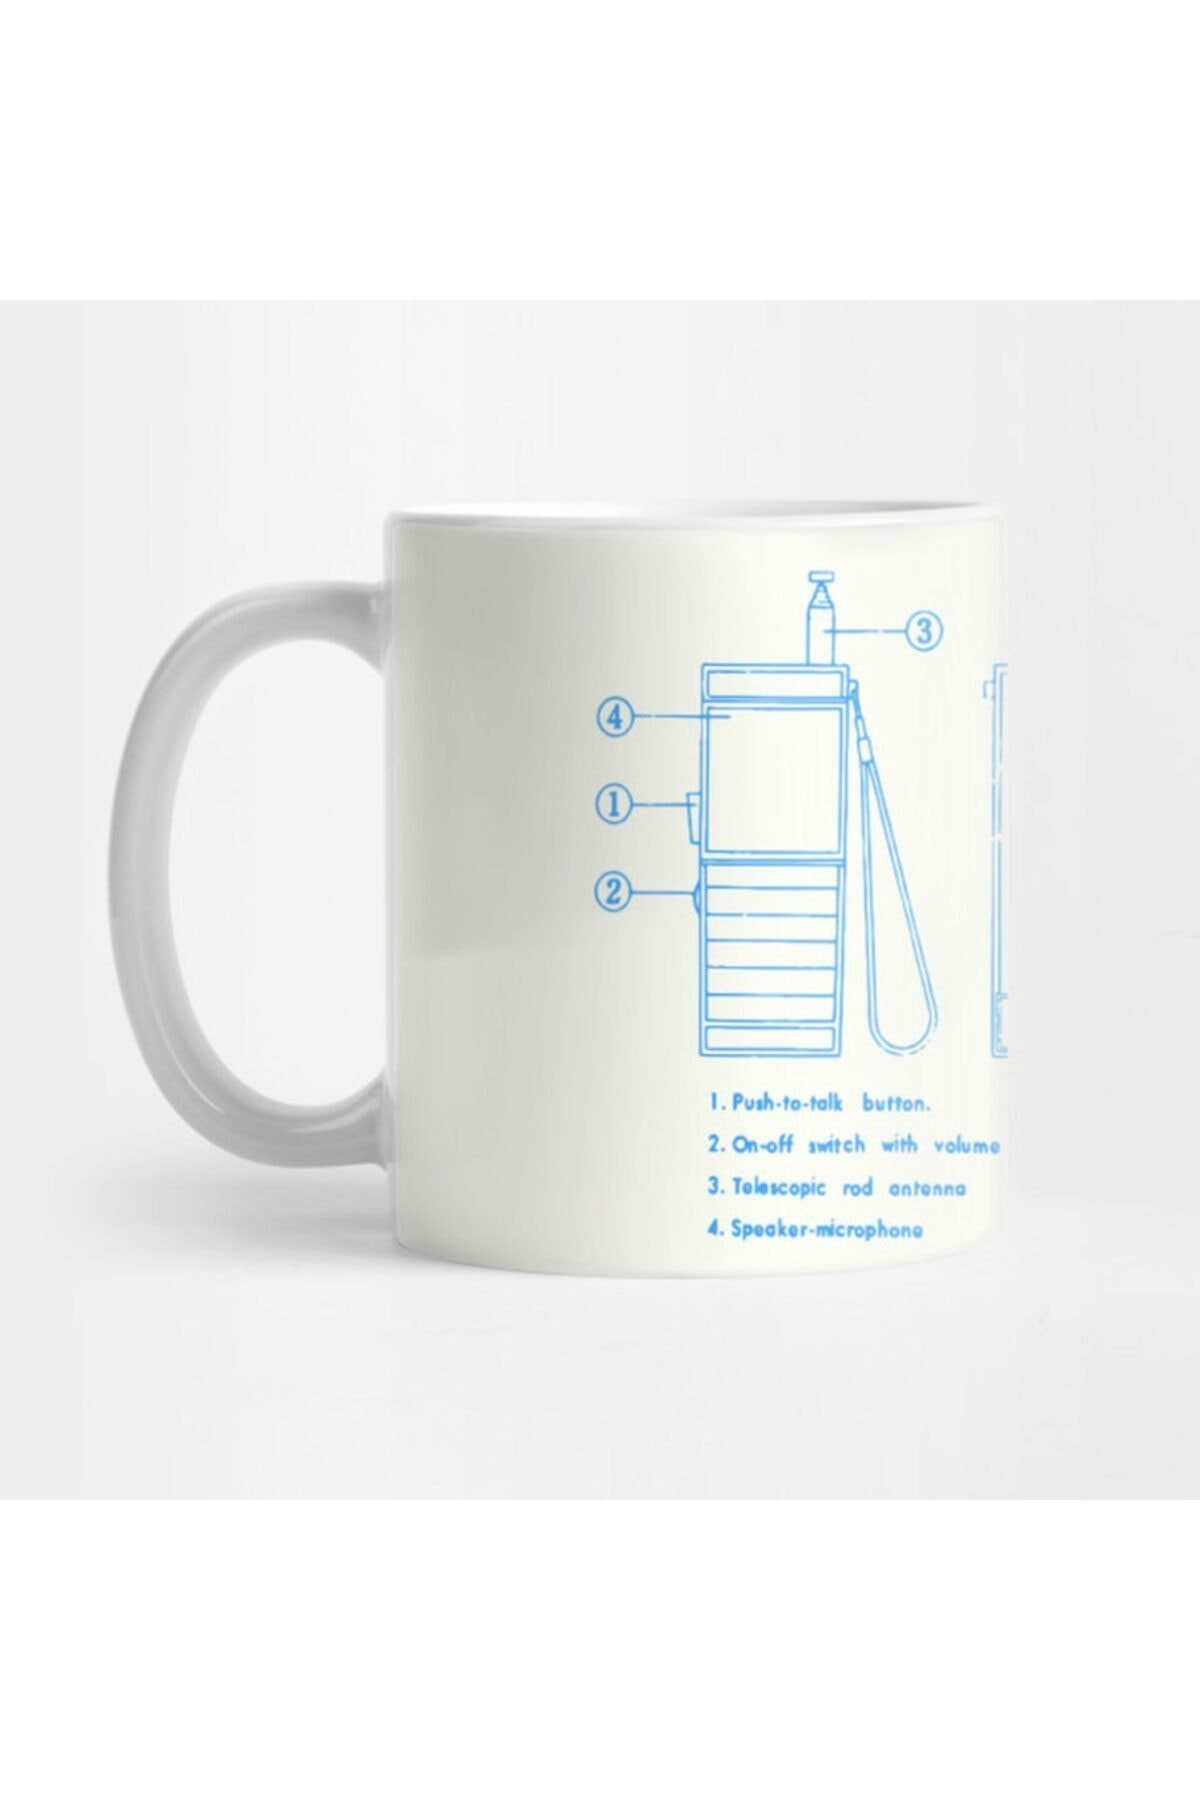 Blueprints Walkie Talkie Secret Technology Schematic Communication Kupa